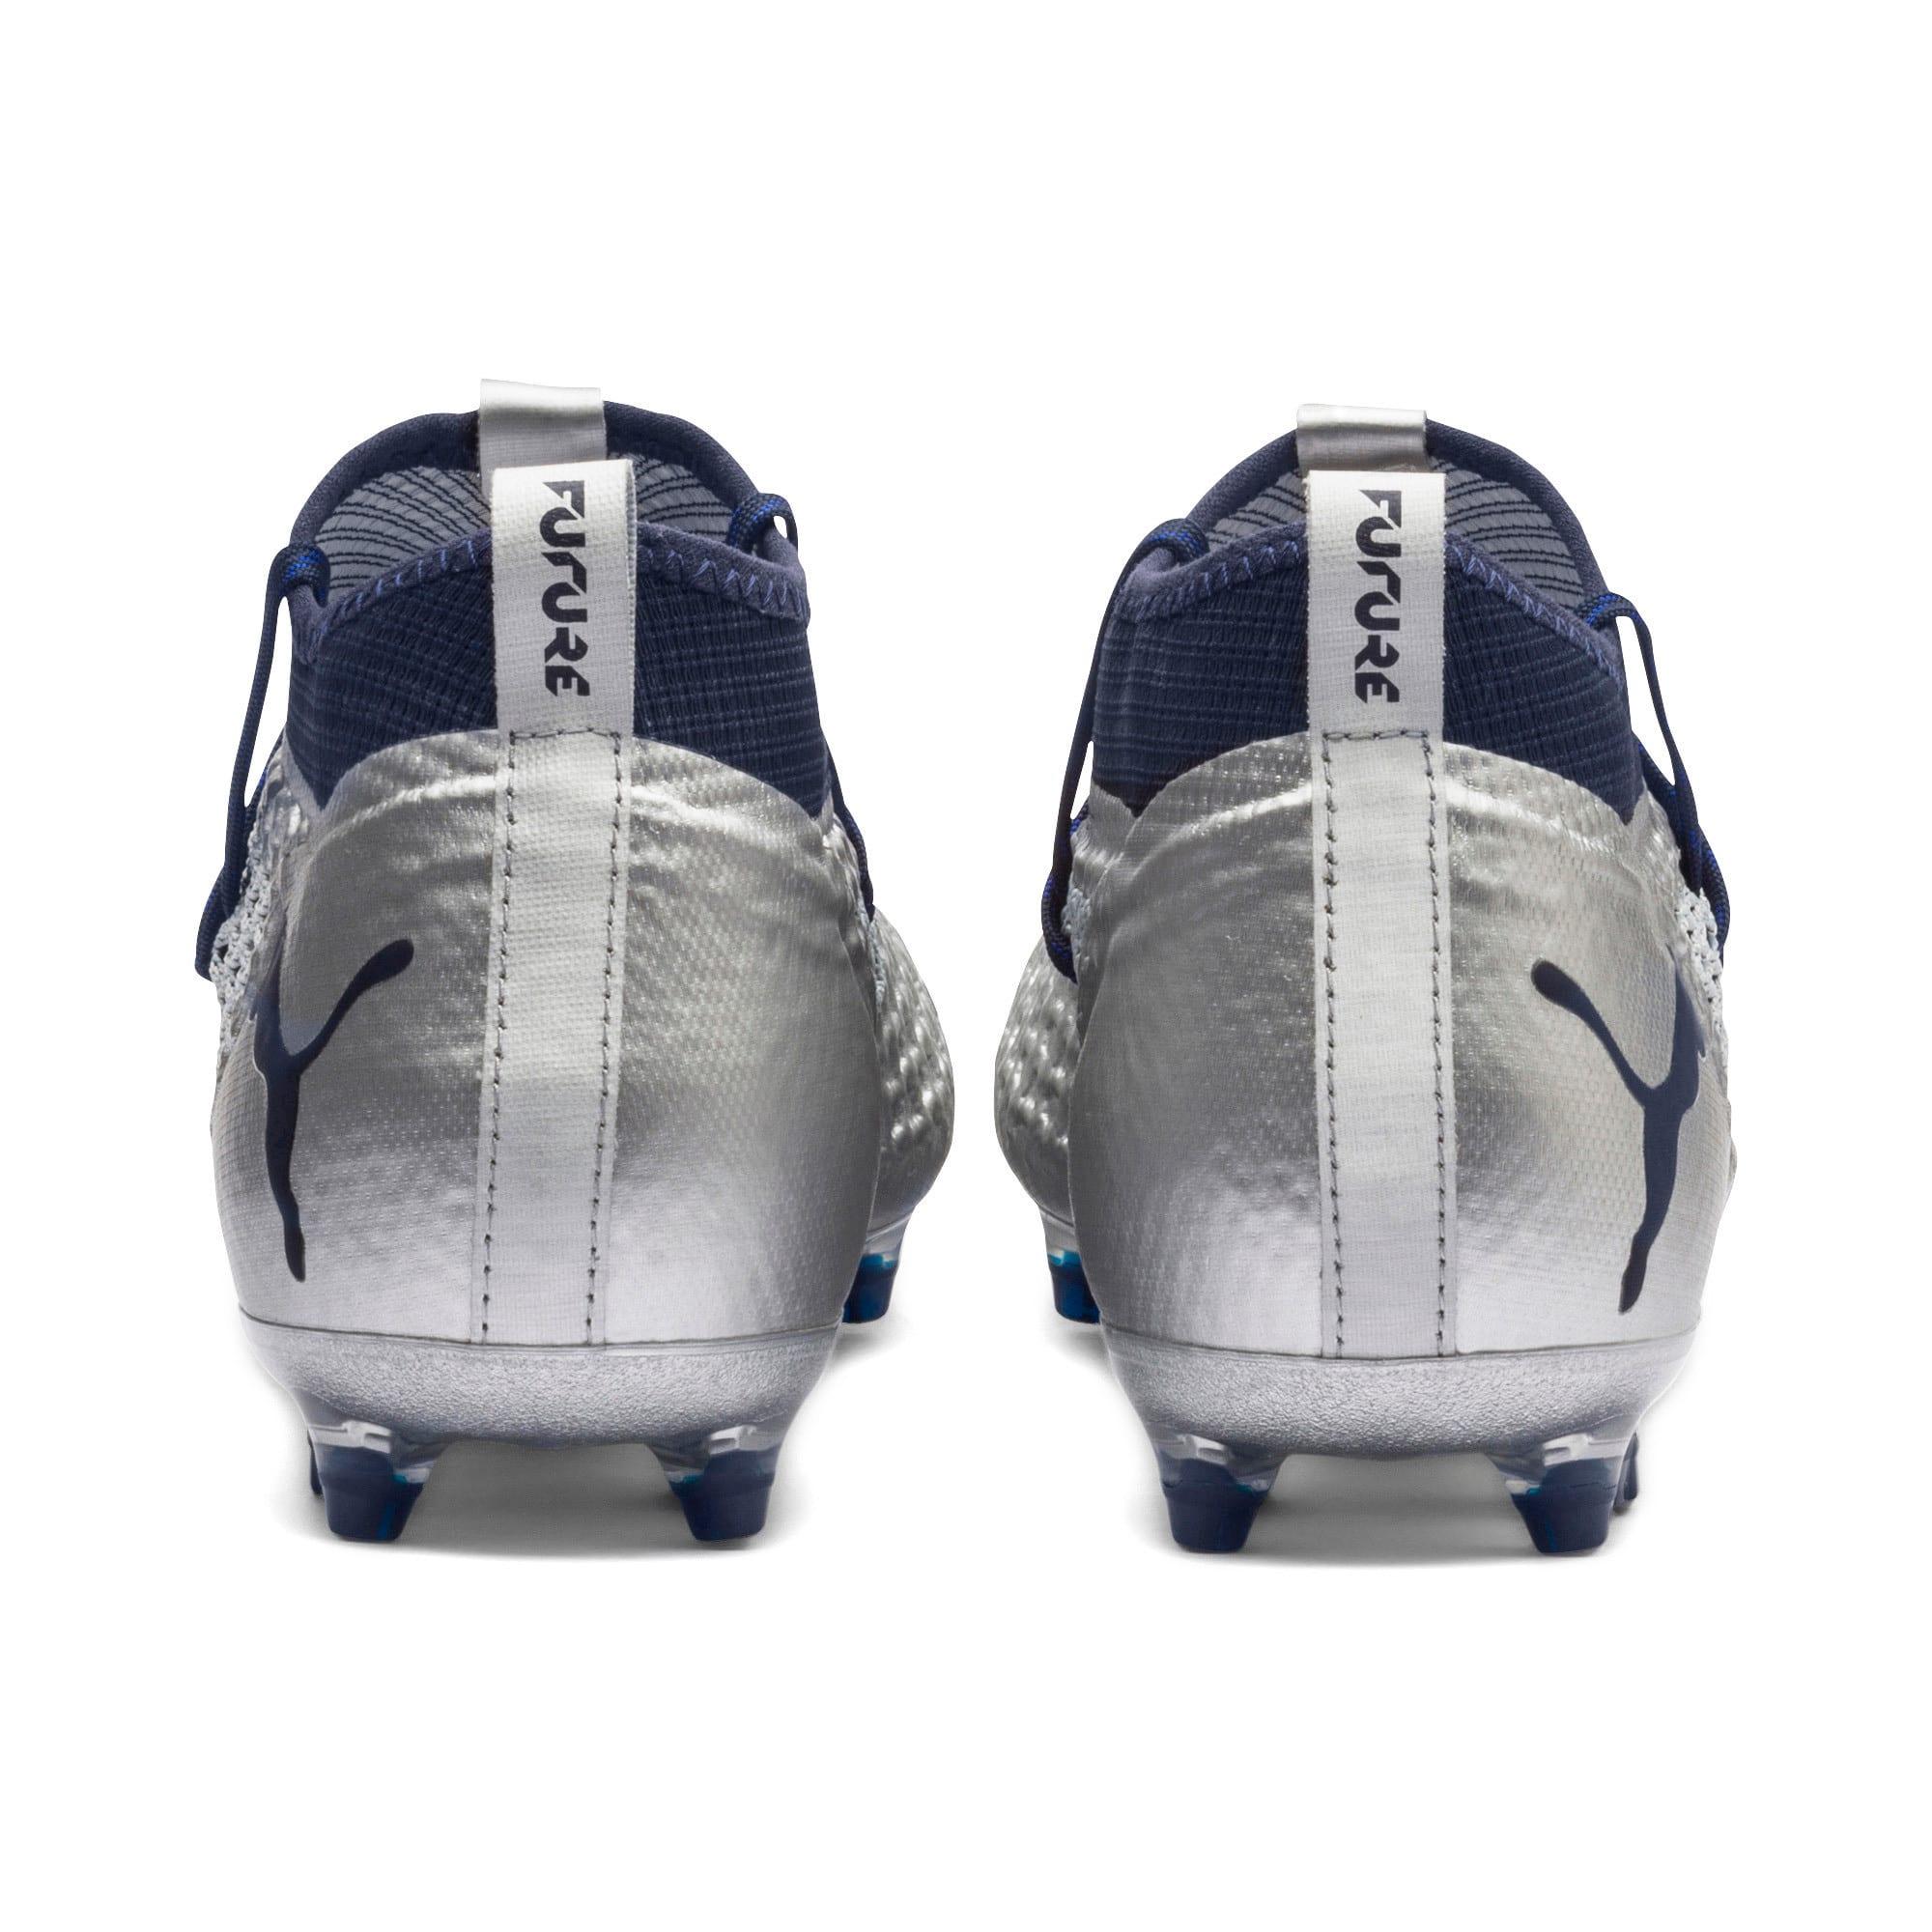 Thumbnail 5 of FUTURE 2.2 NETFIT FG/AG  Football Boots, Puma Silver-Peacoat, medium-IND